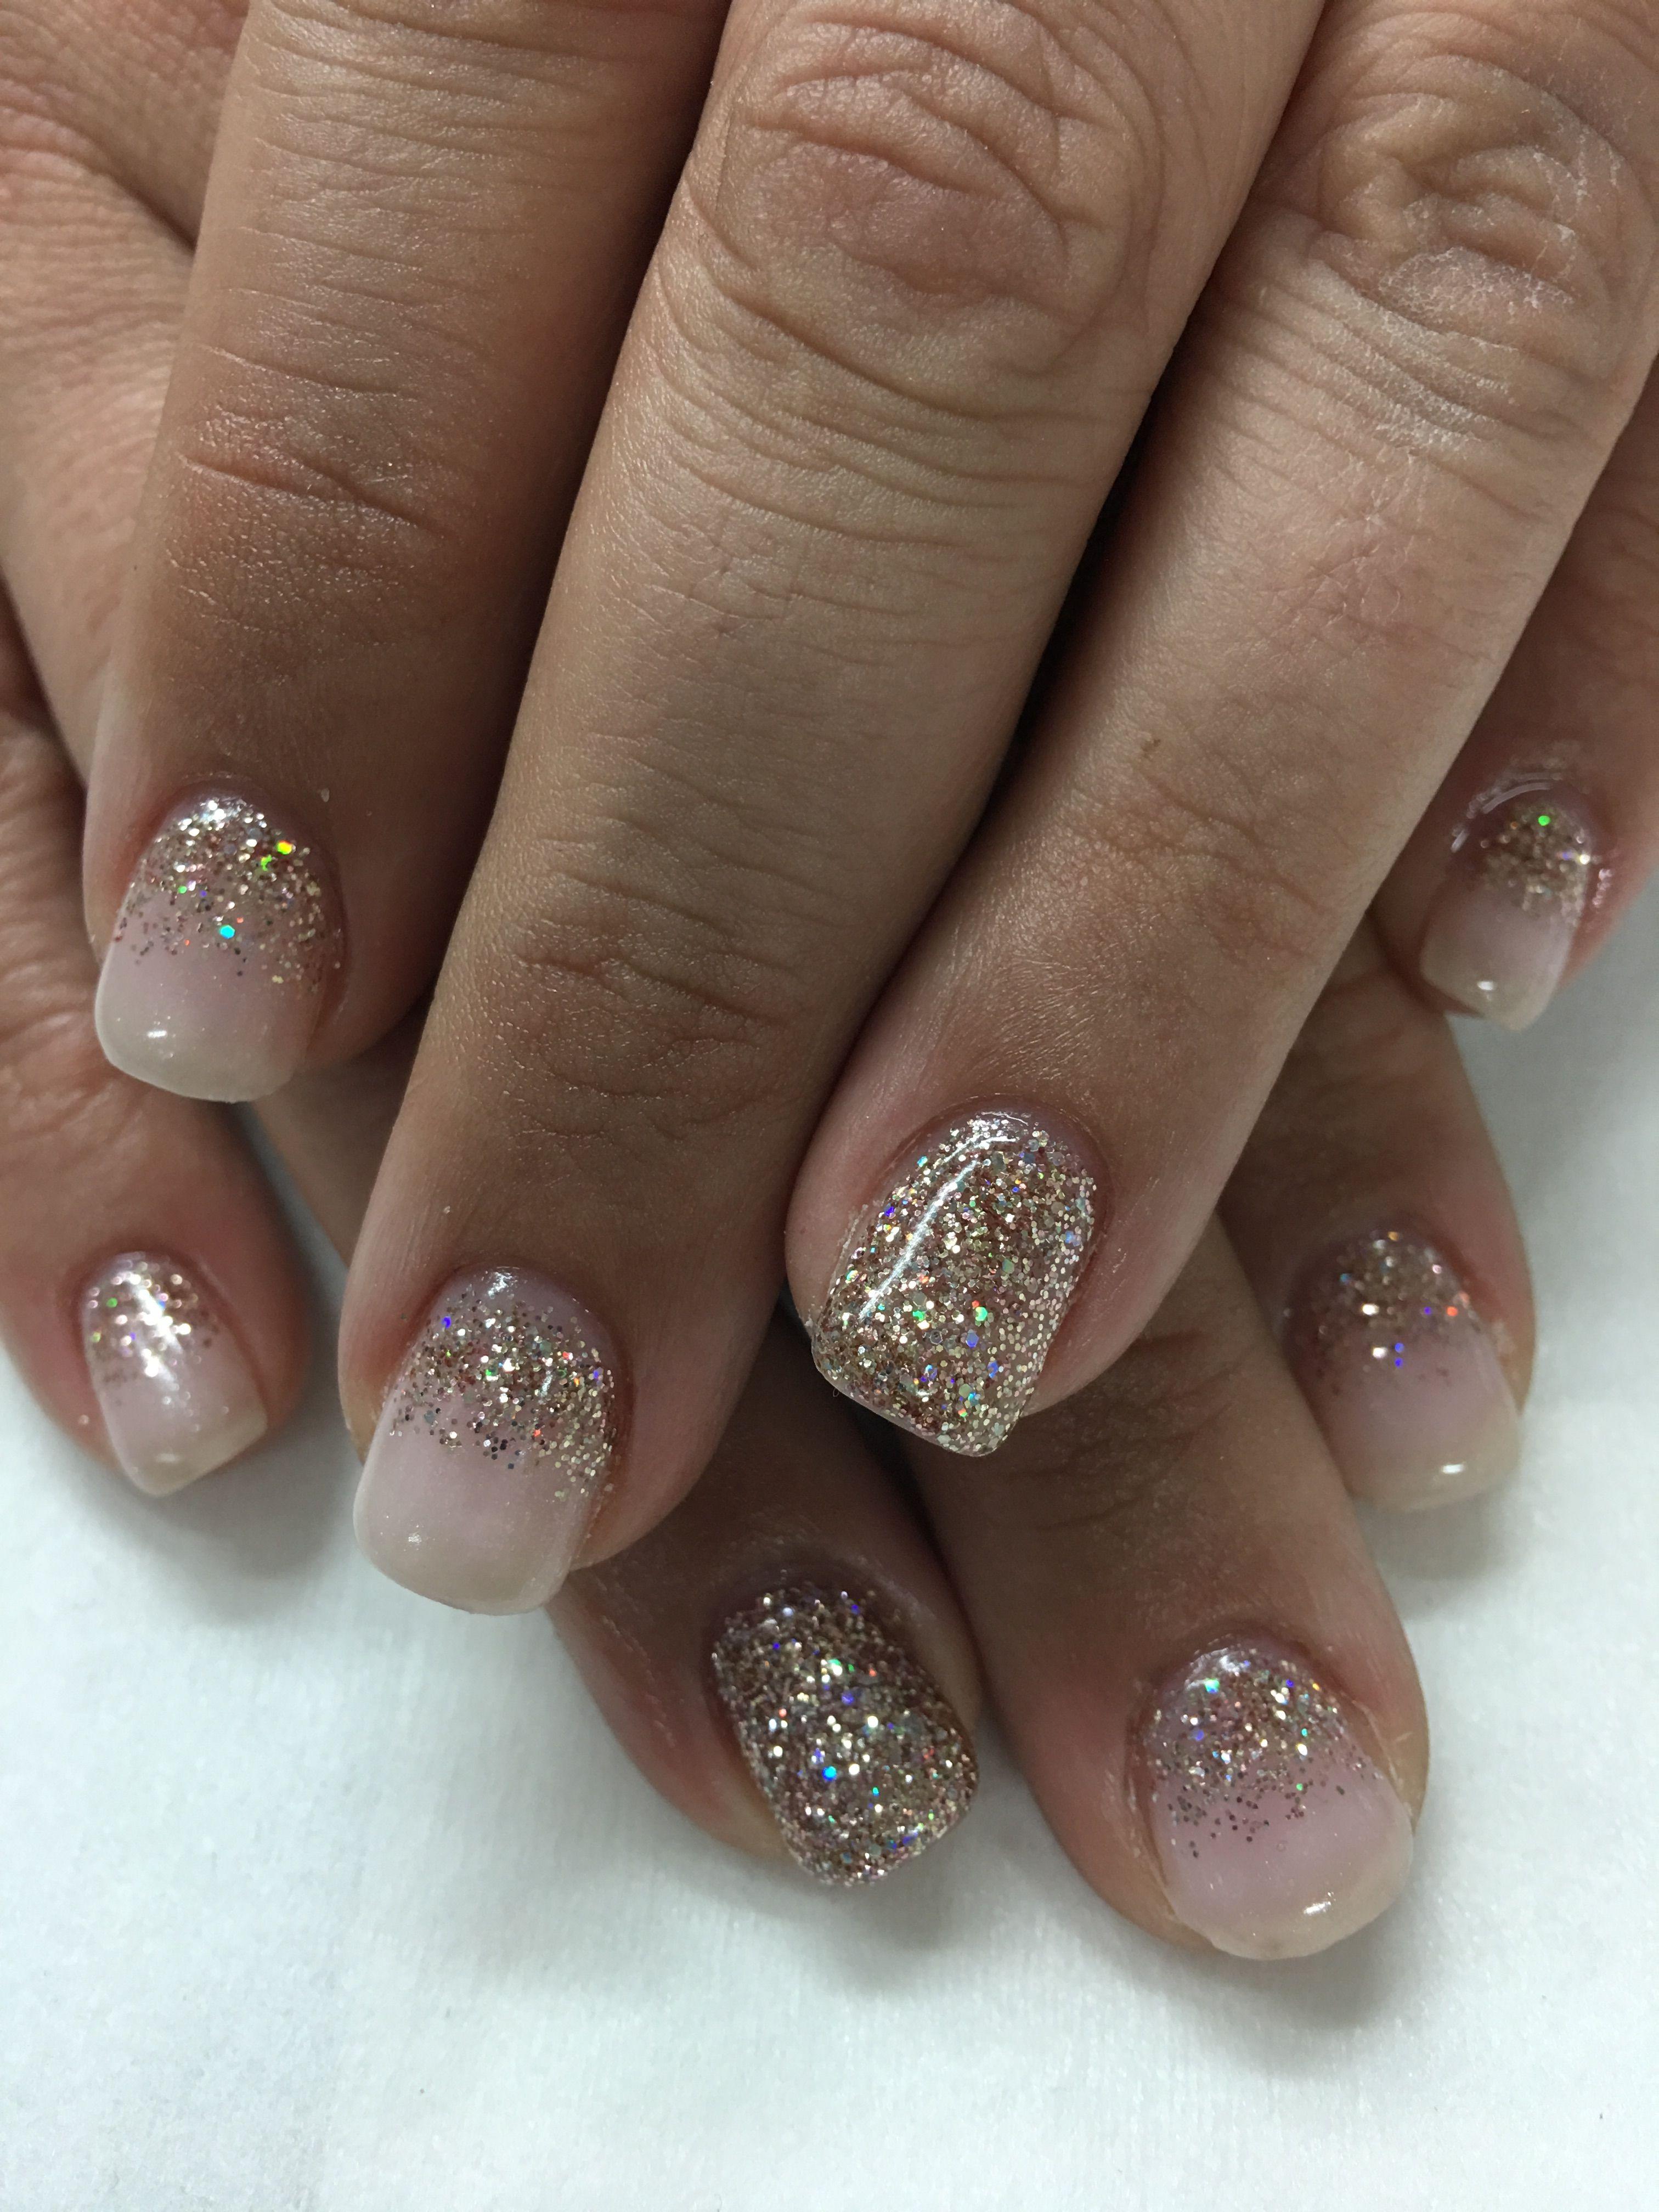 OPI Bubble Bath Light Elegance Champagne Glitter Gel Nails | Gel ...